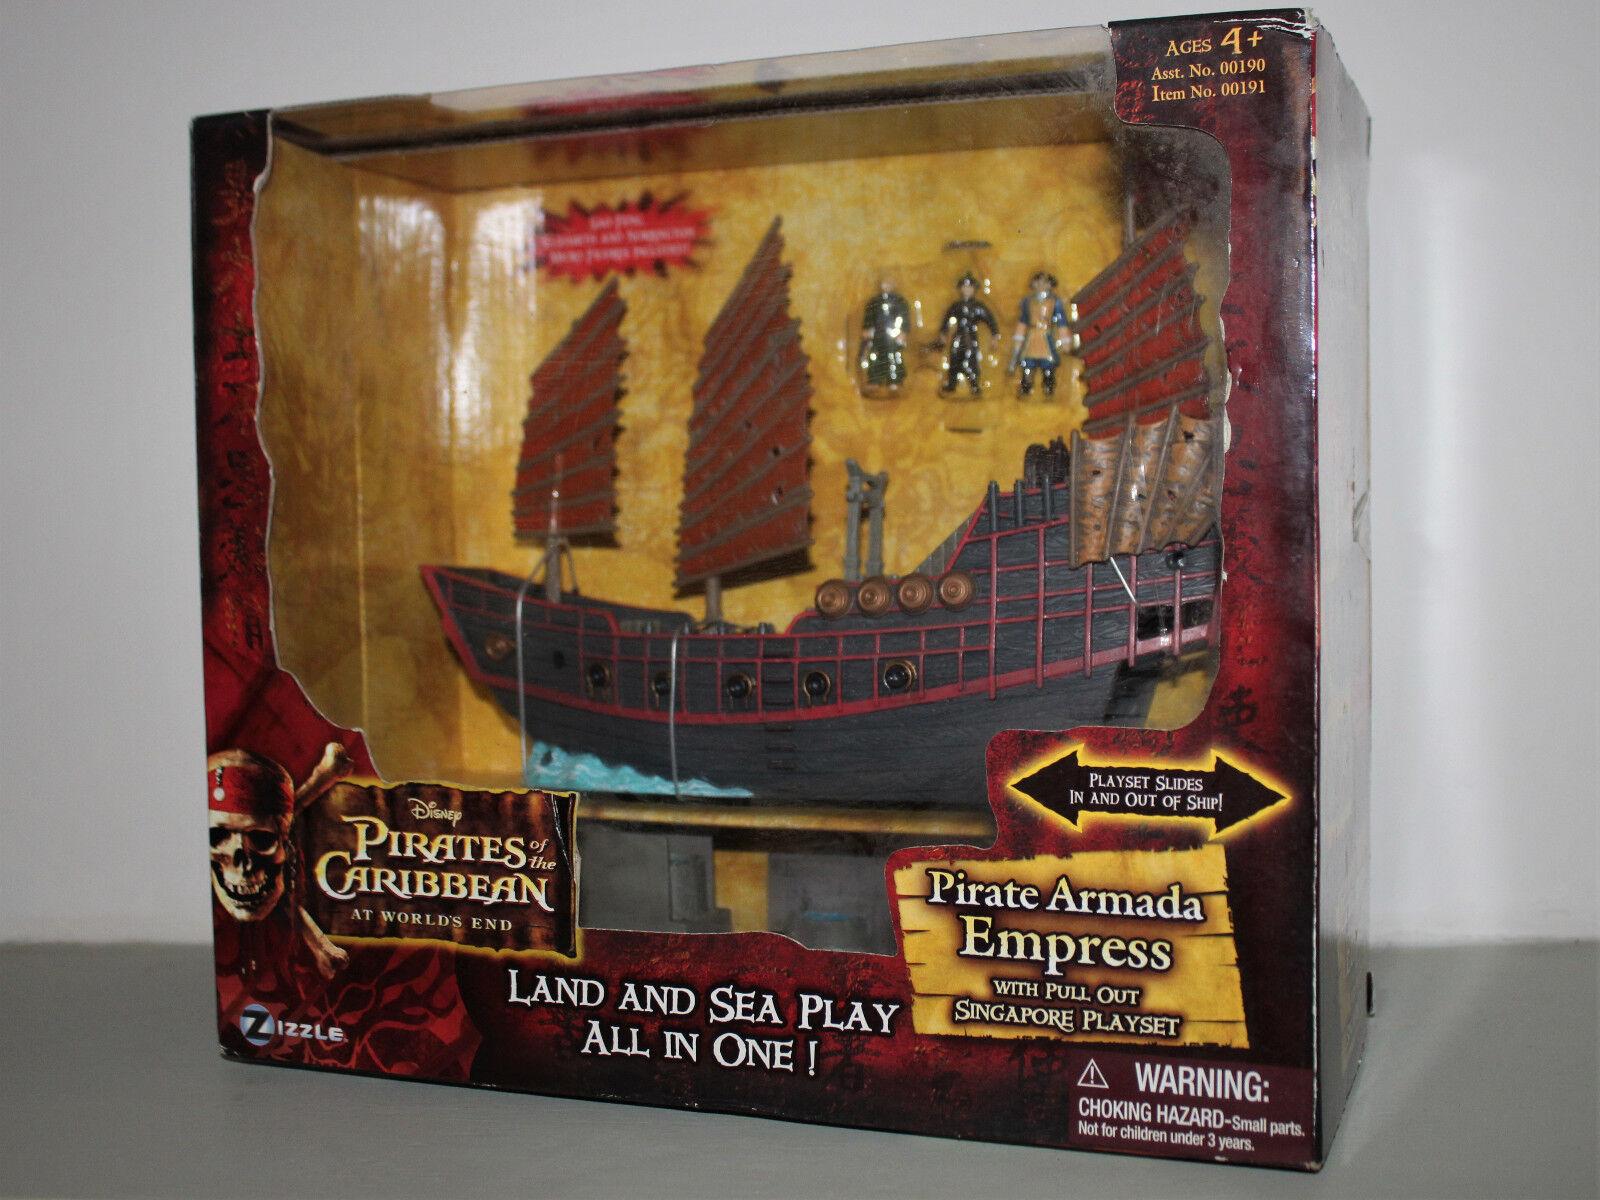 Pirates of the Caribean - Pirate Armada Express & Playset - Zizzle 2007 - New